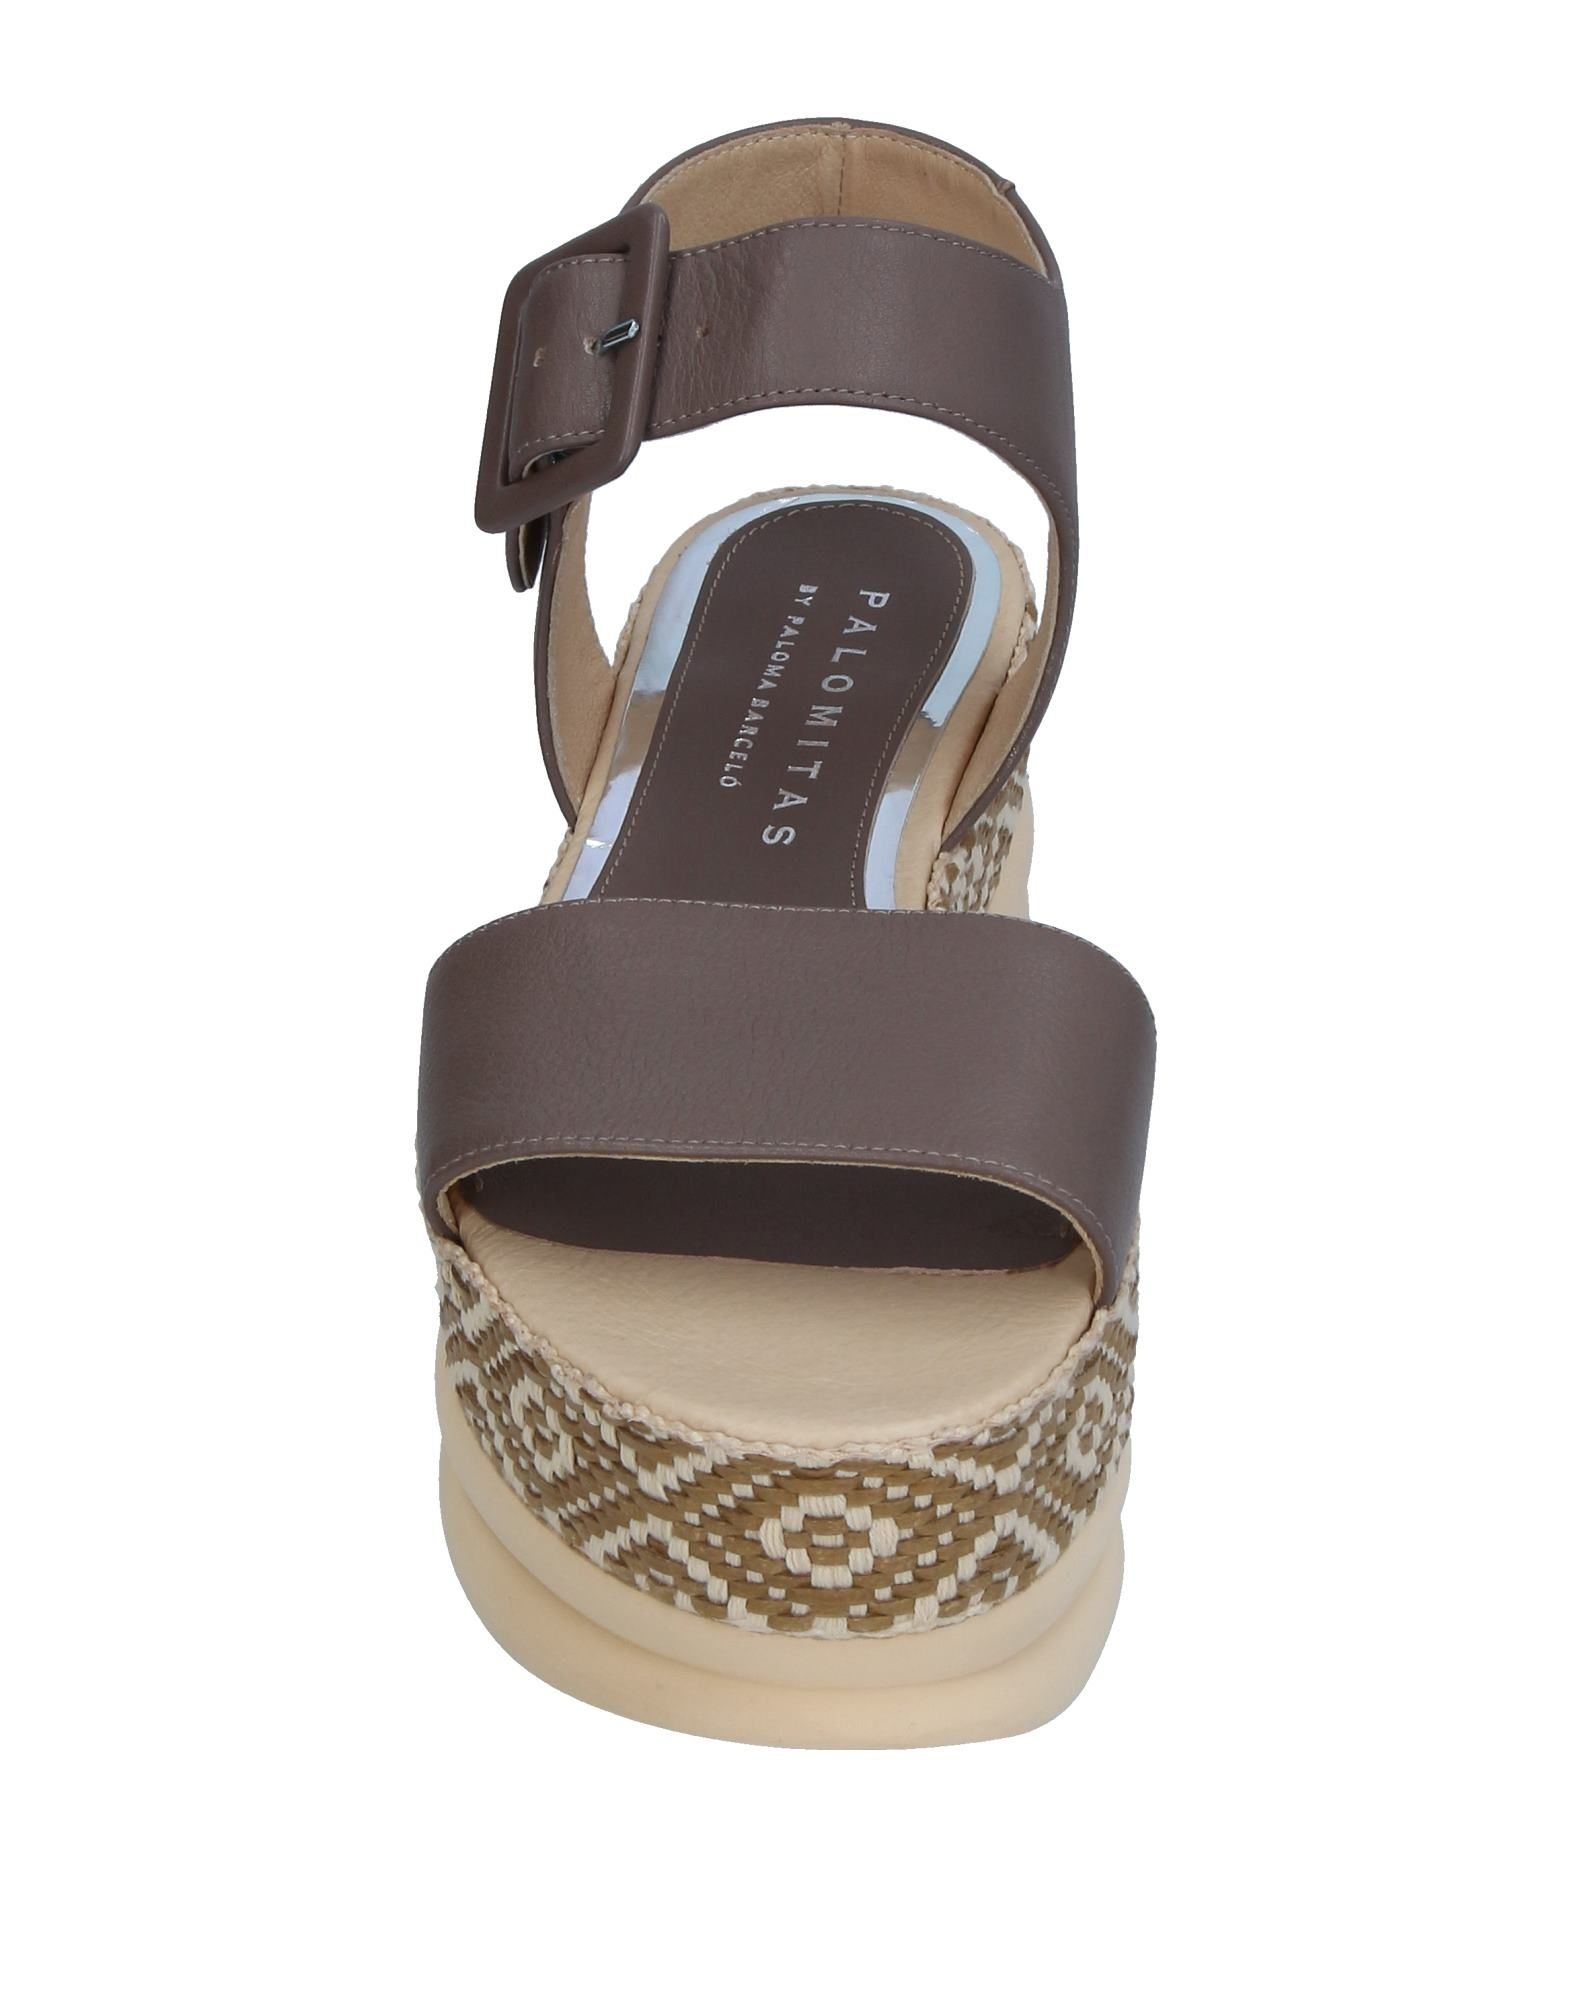 Palomitas By Paloma Damen Barceló Sandalen Damen Paloma  11356640BV Gute Qualität beliebte Schuhe 5be1ed